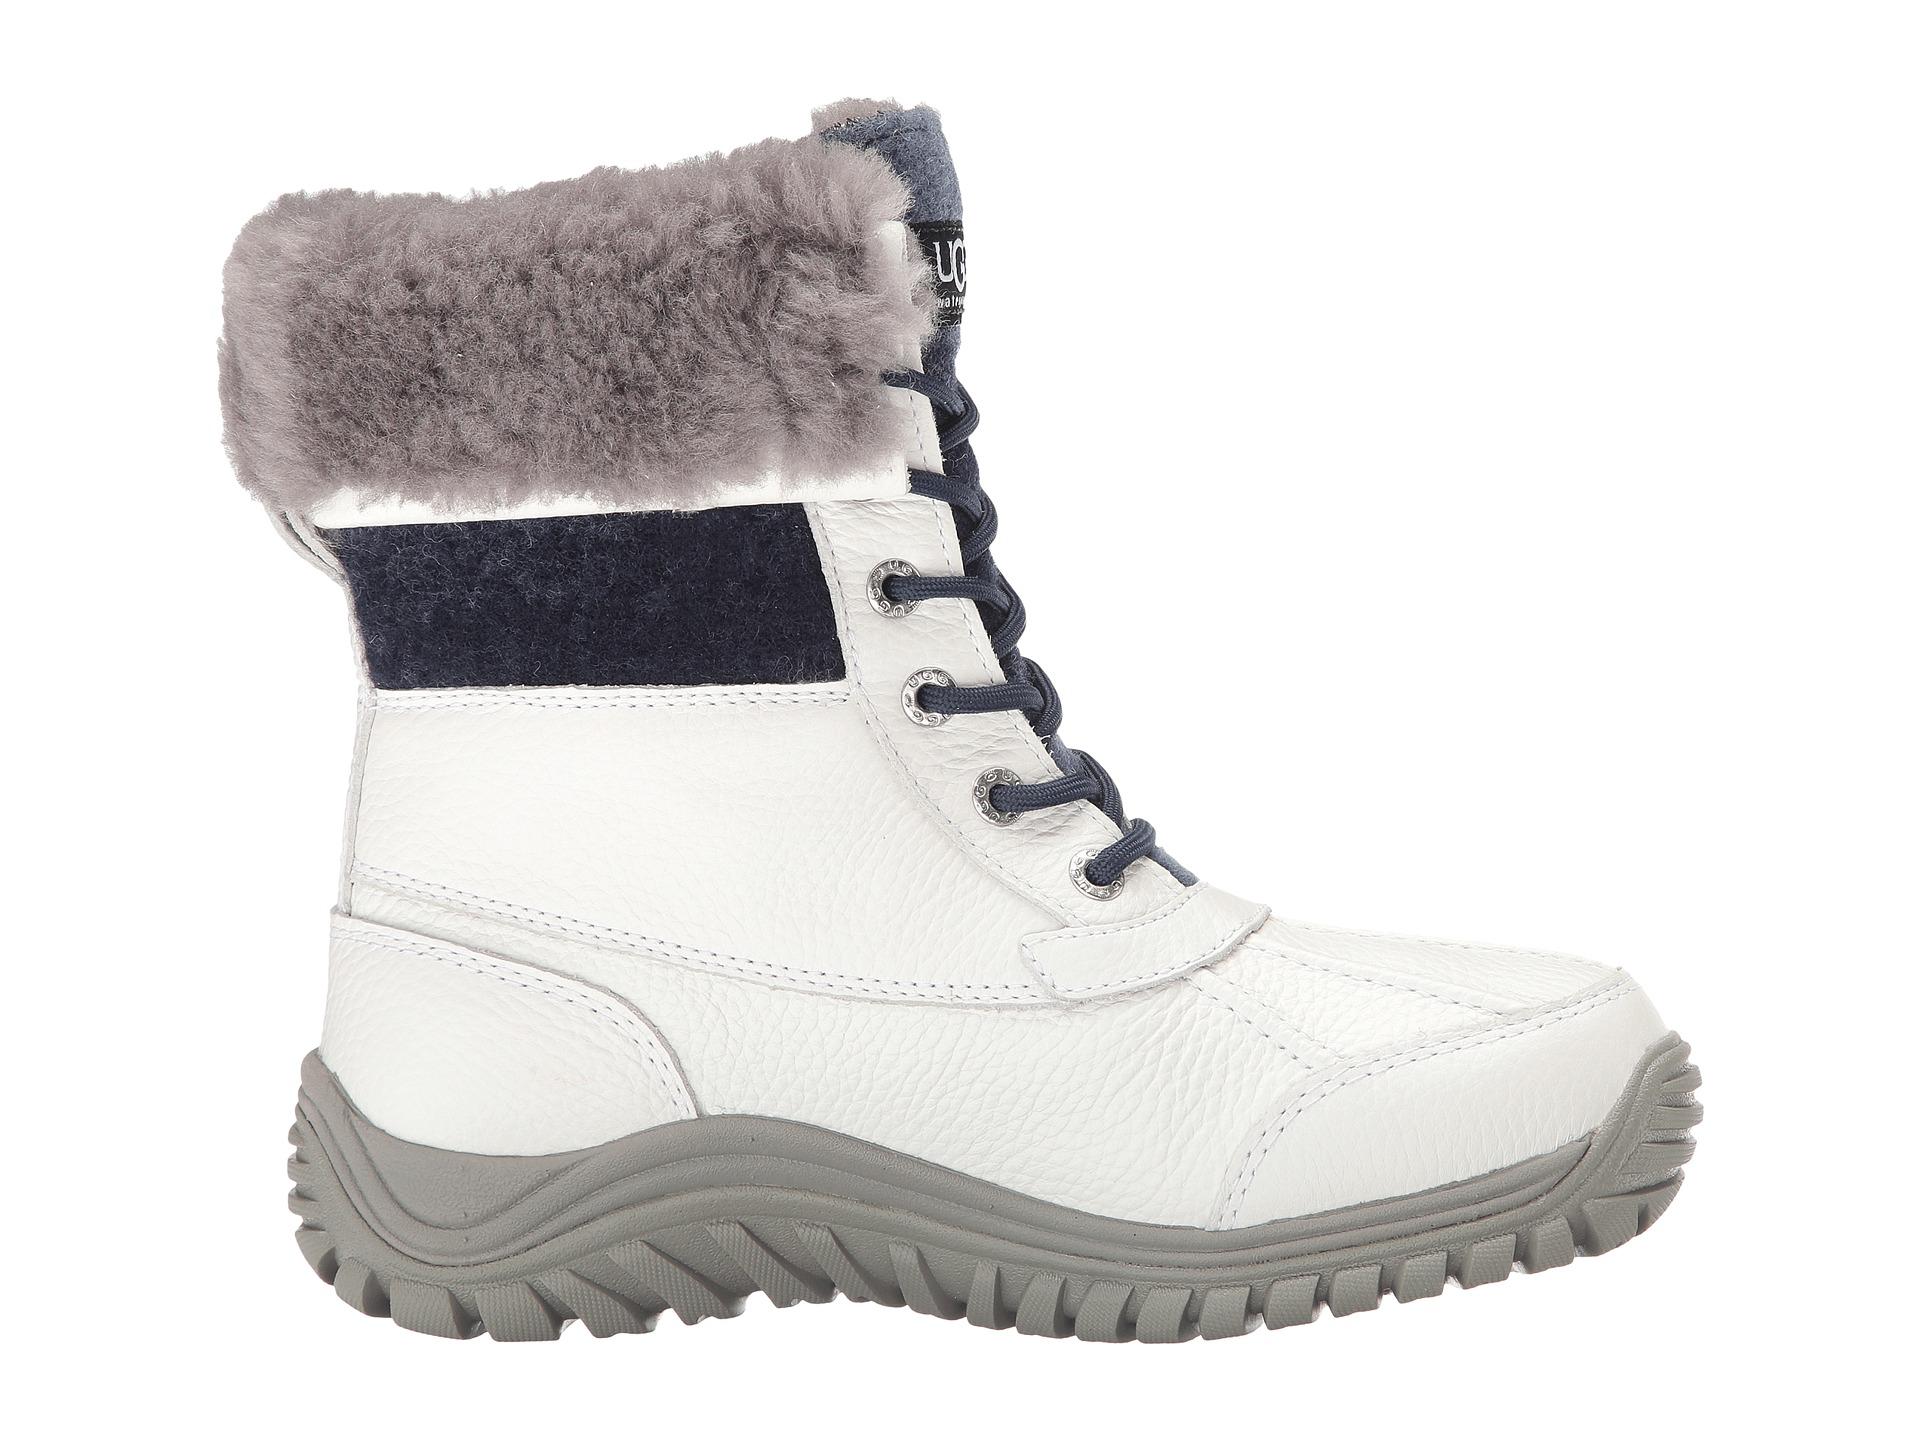 eae322fdace Adirondack 11 Ugg Boots - cheap watches mgc-gas.com